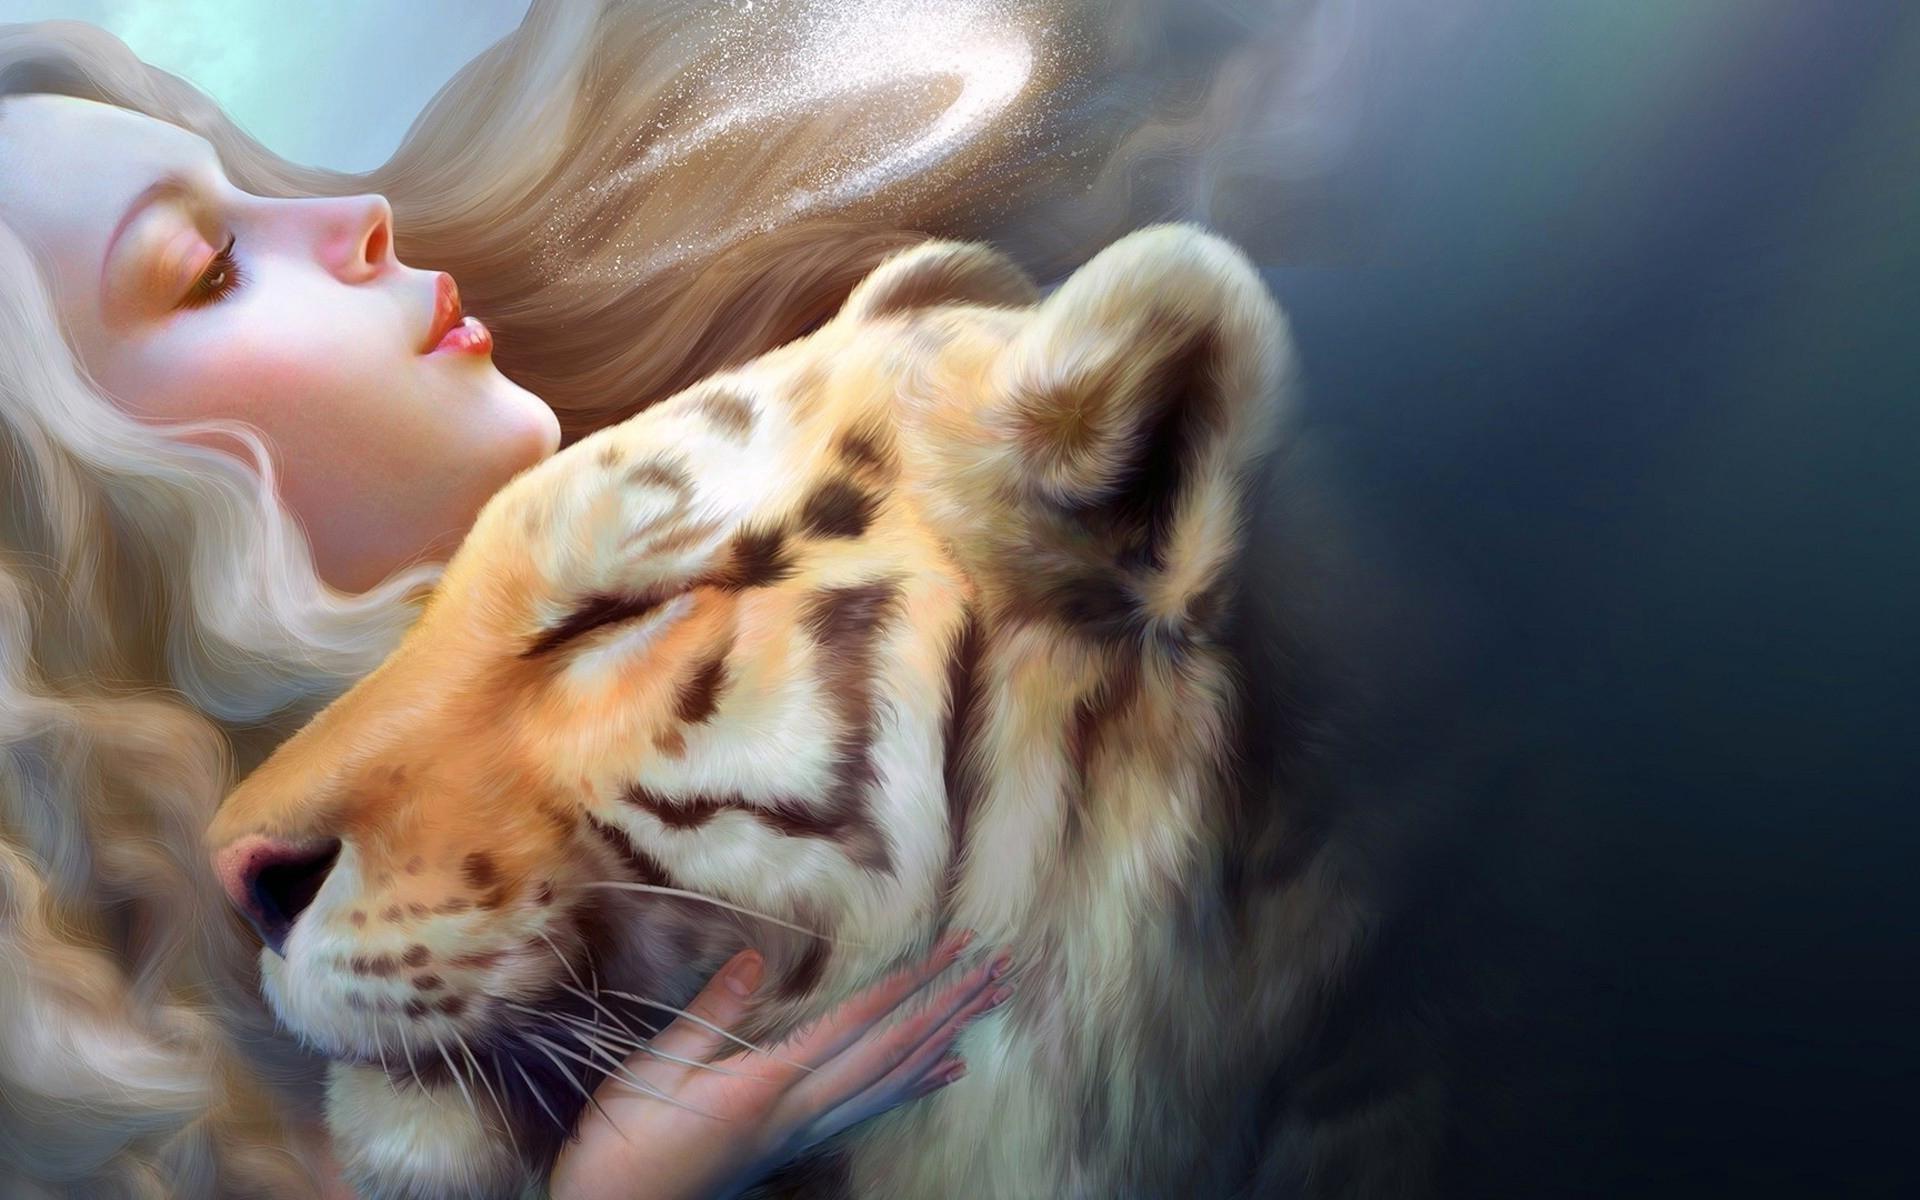 girl tiger art | artist hd 4k wallpapers